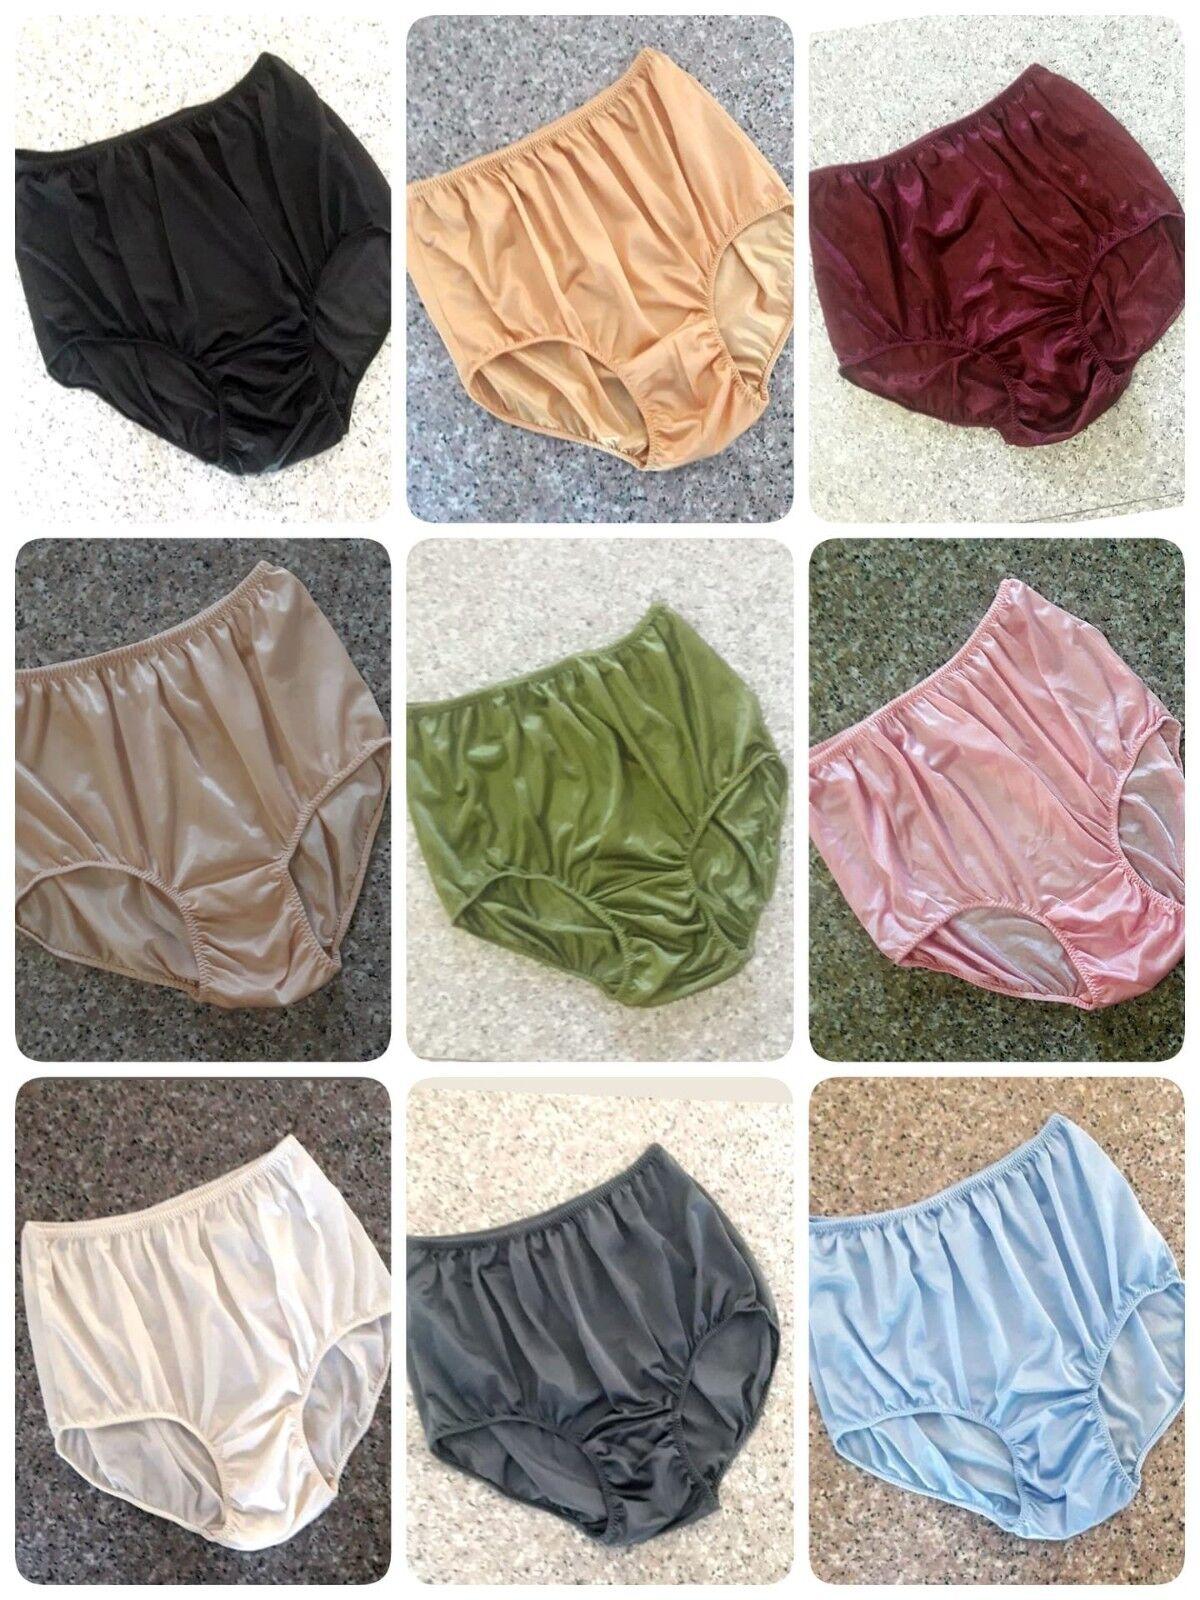 3XL Large Full Briefs Nylon Sheer Knickers Underwear Lingerie Panties Women Men